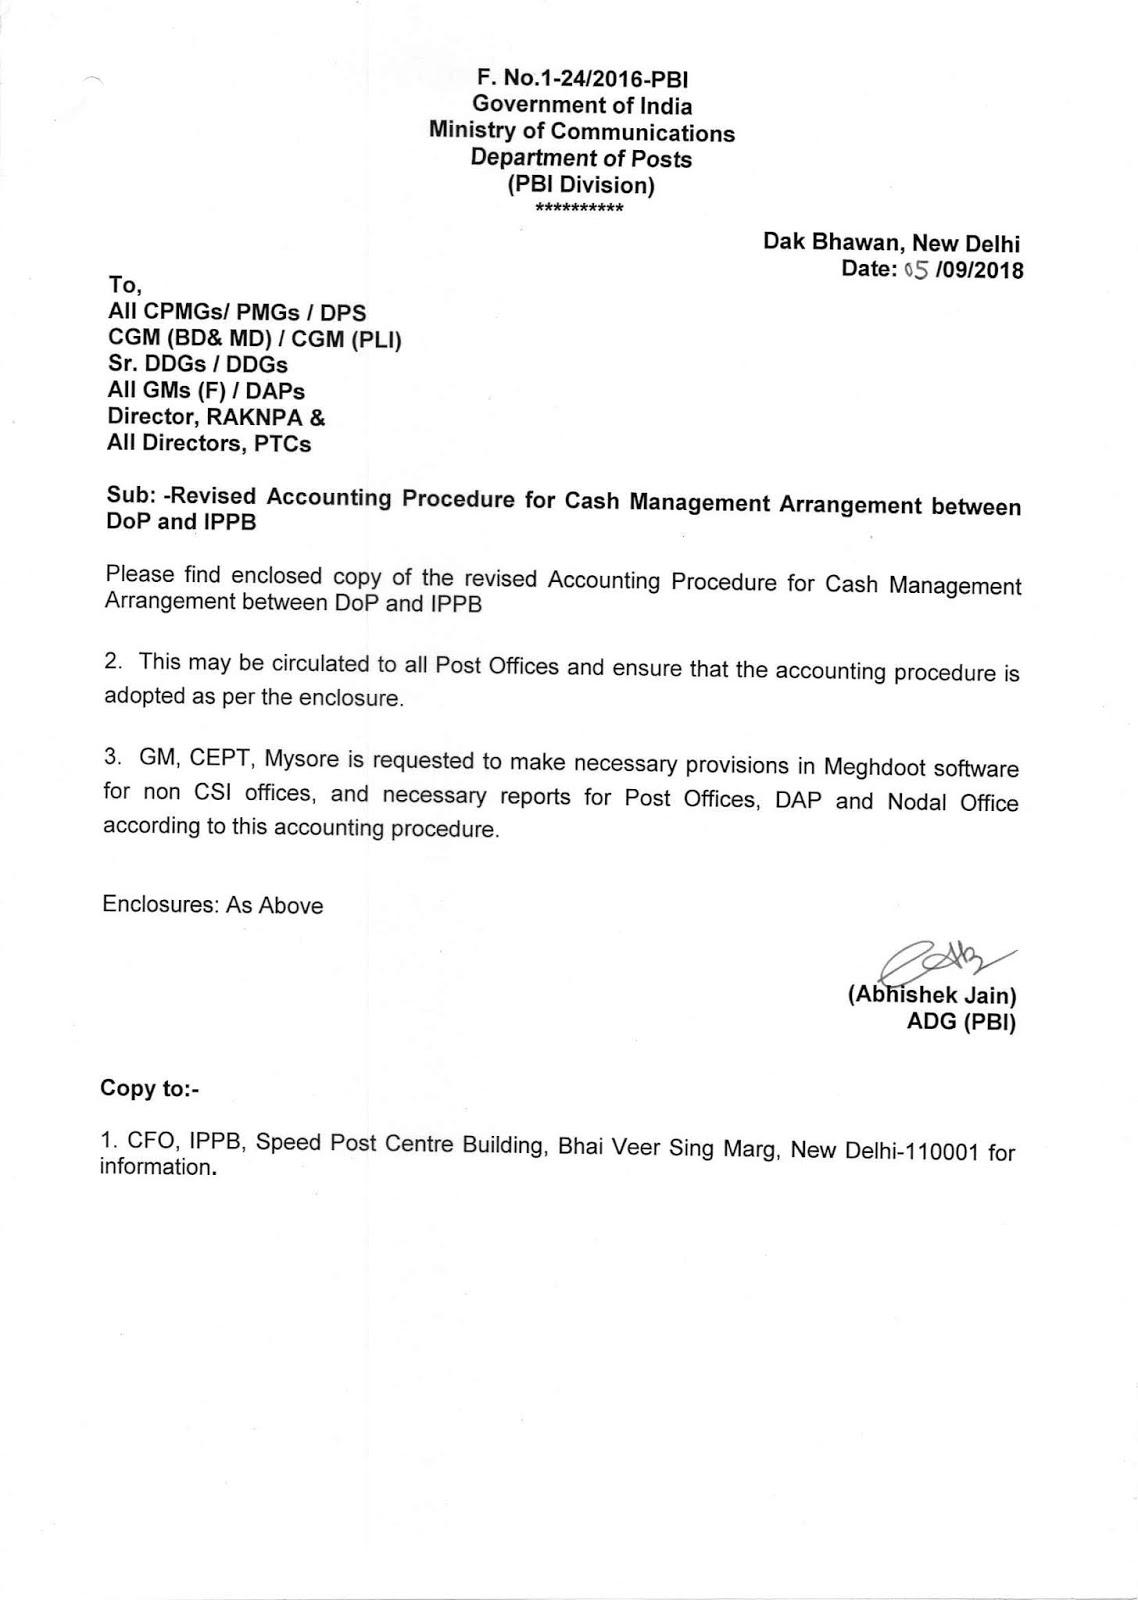 All India Association of Inspectors and Asstt  Supdt Posts